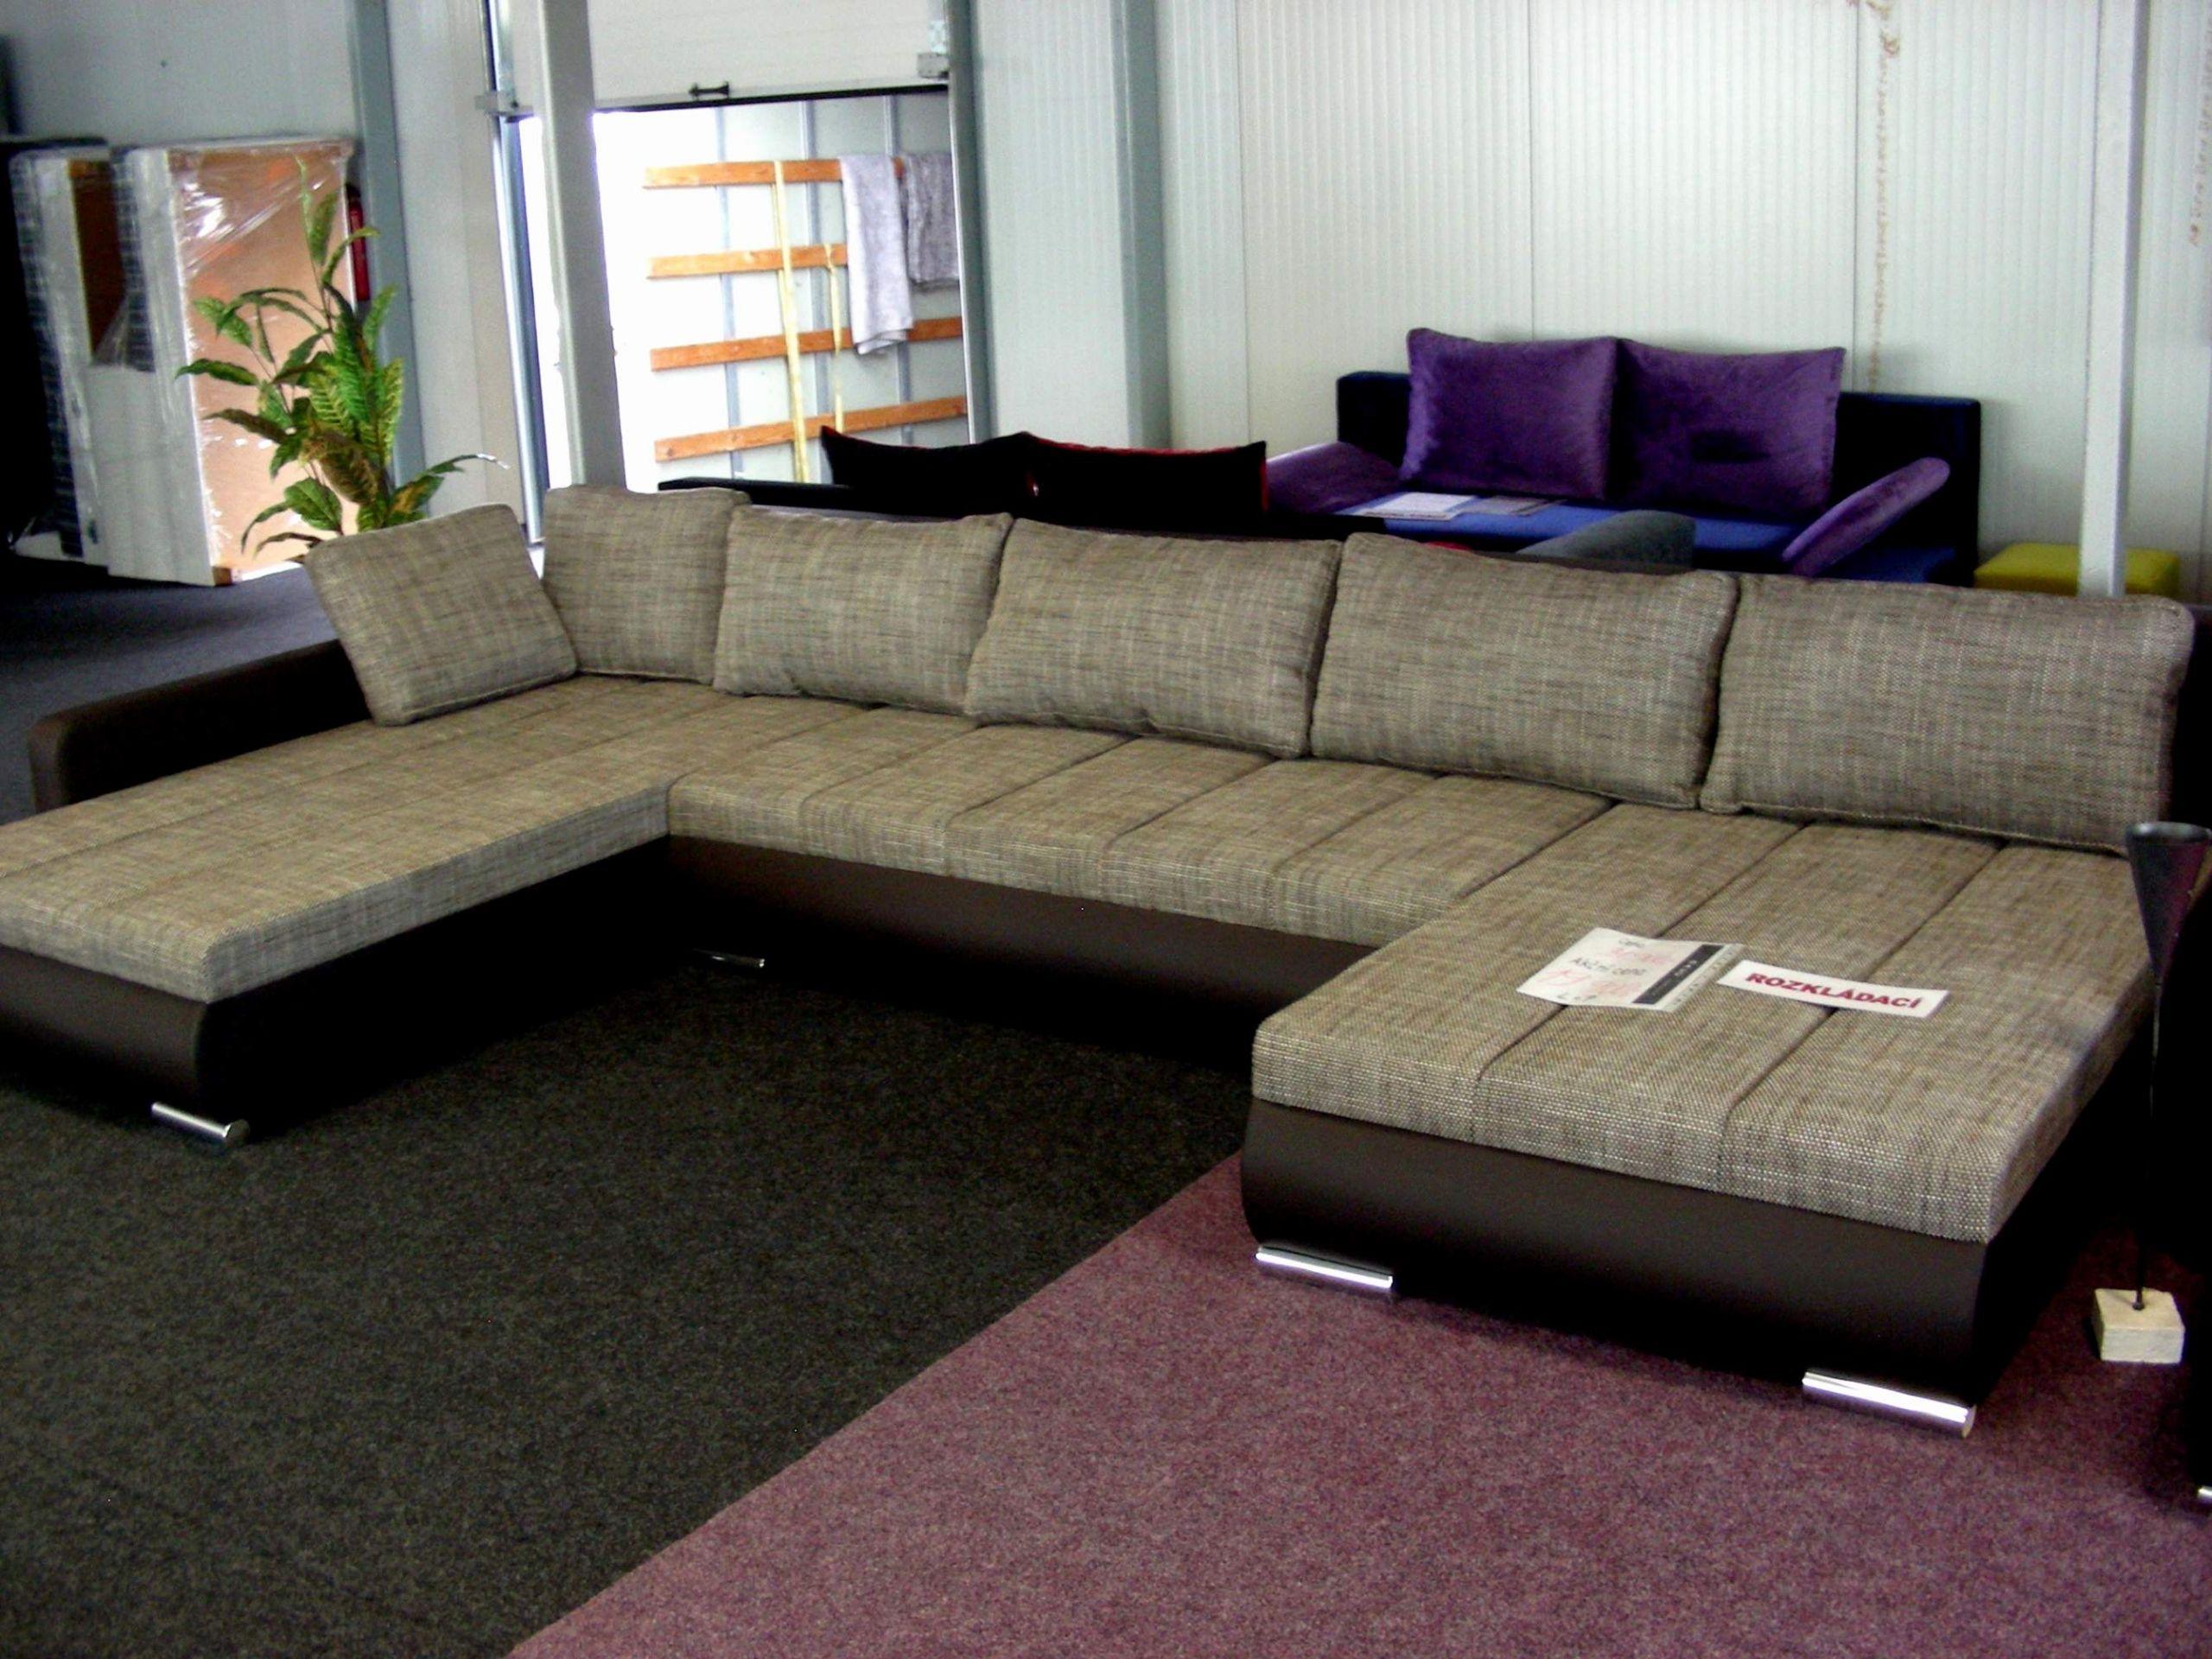 dekoideen wohnzimmer wand luxus deko wohnzimmer wand frisch 42 inspirierend garten wand of dekoideen wohnzimmer wand